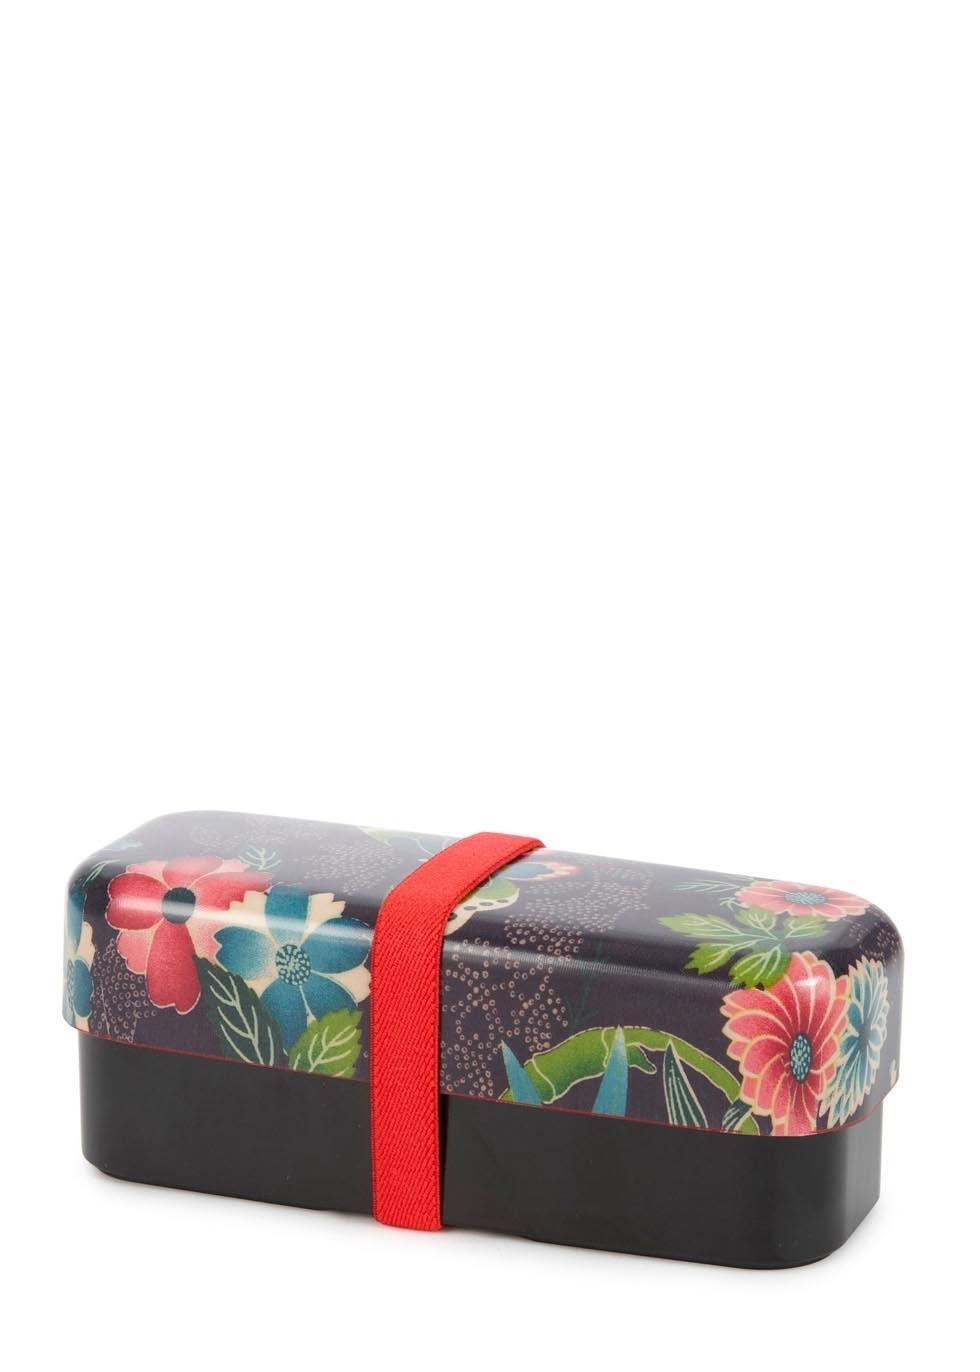 hakoya kimono murasaki bento box harvey nichols. Black Bedroom Furniture Sets. Home Design Ideas